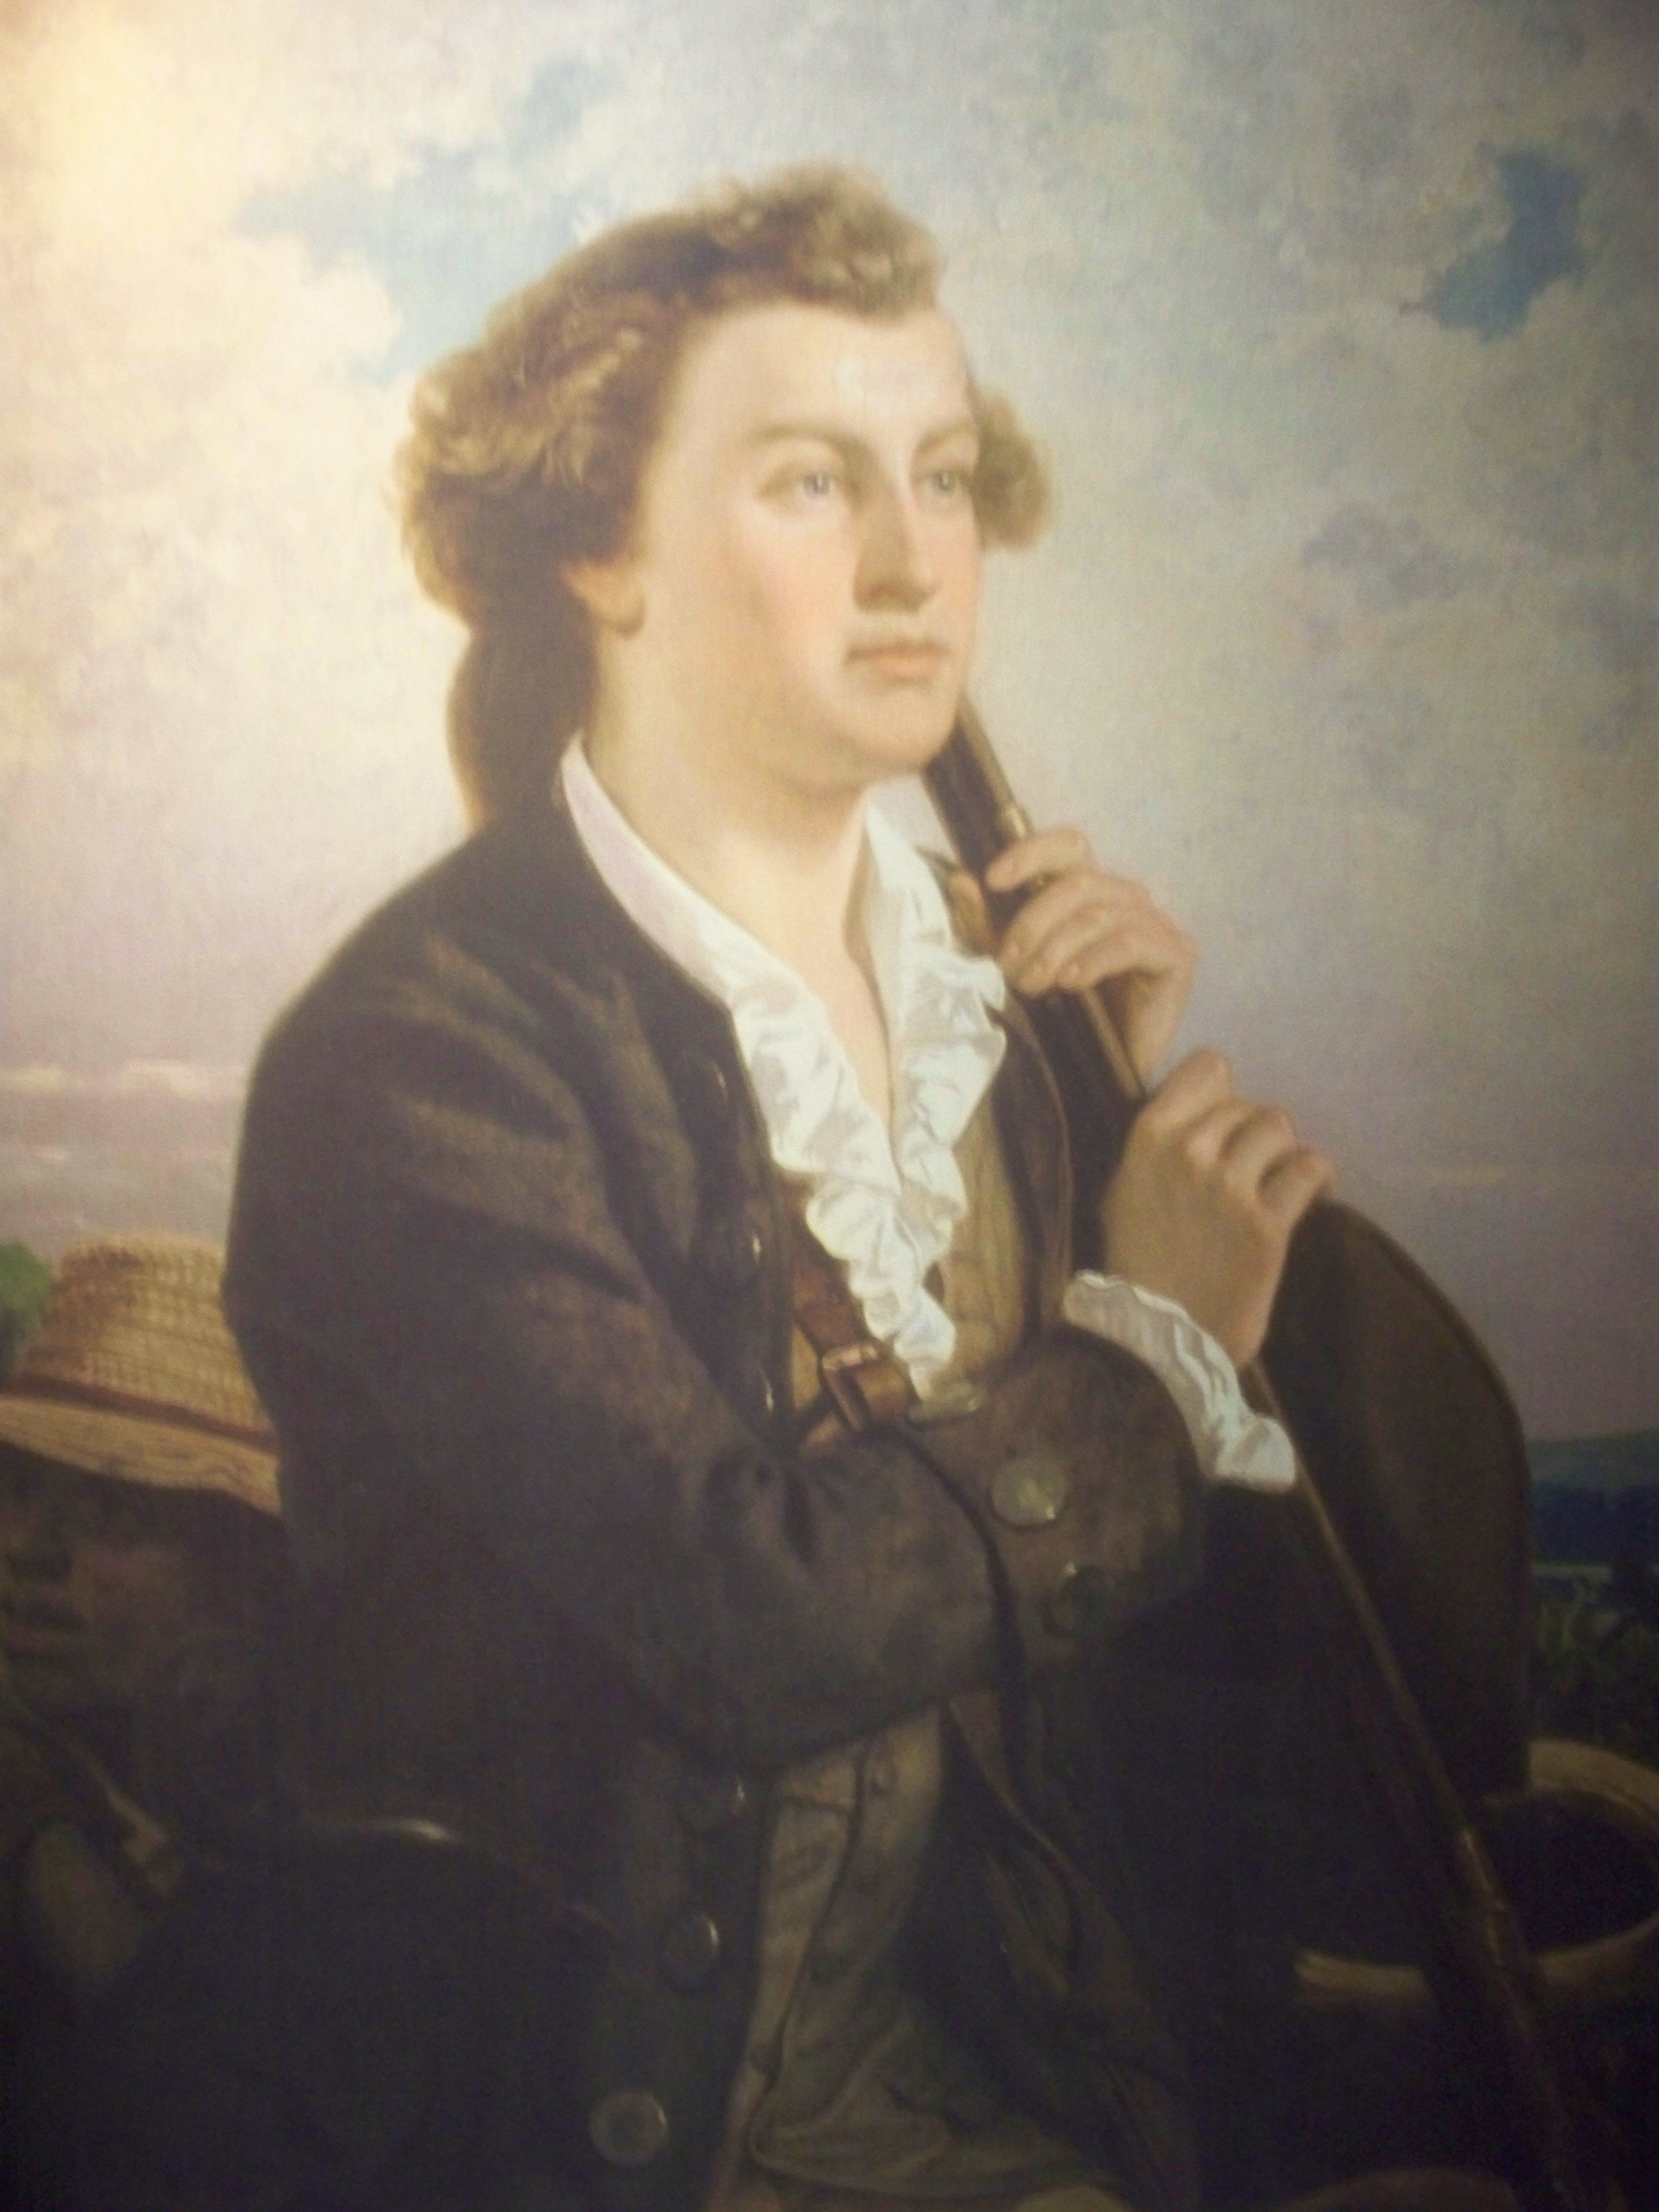 George Washington as a Young Boy   Young boys